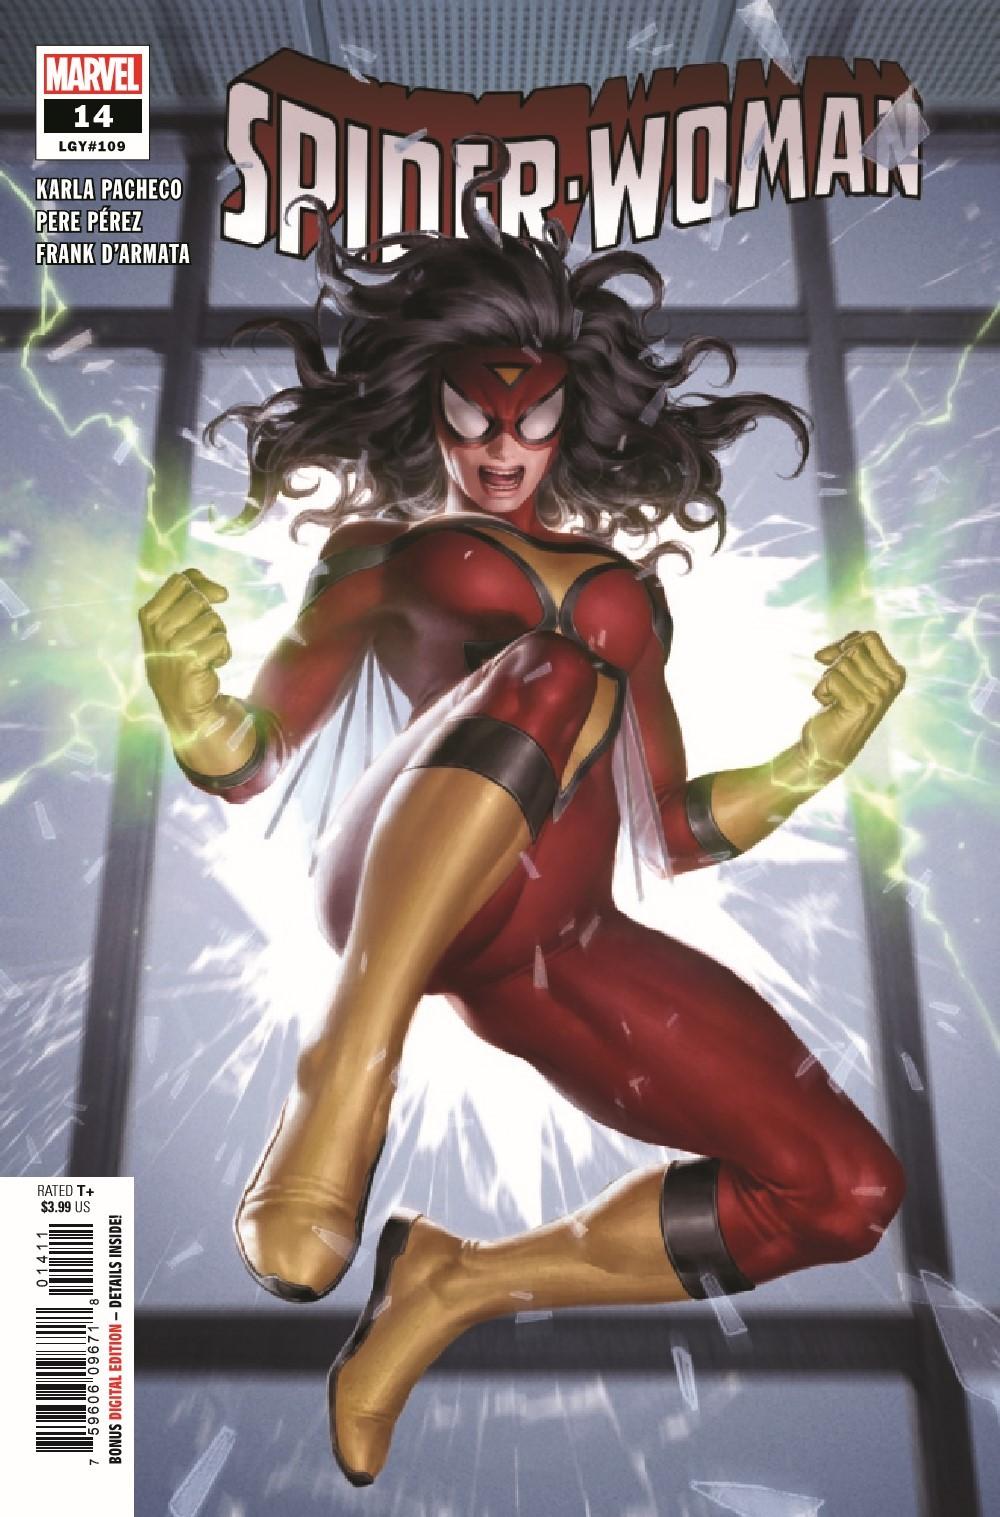 SWOMAN2020014_Preview-1 ComicList Previews: SPIDER-WOMAN #14